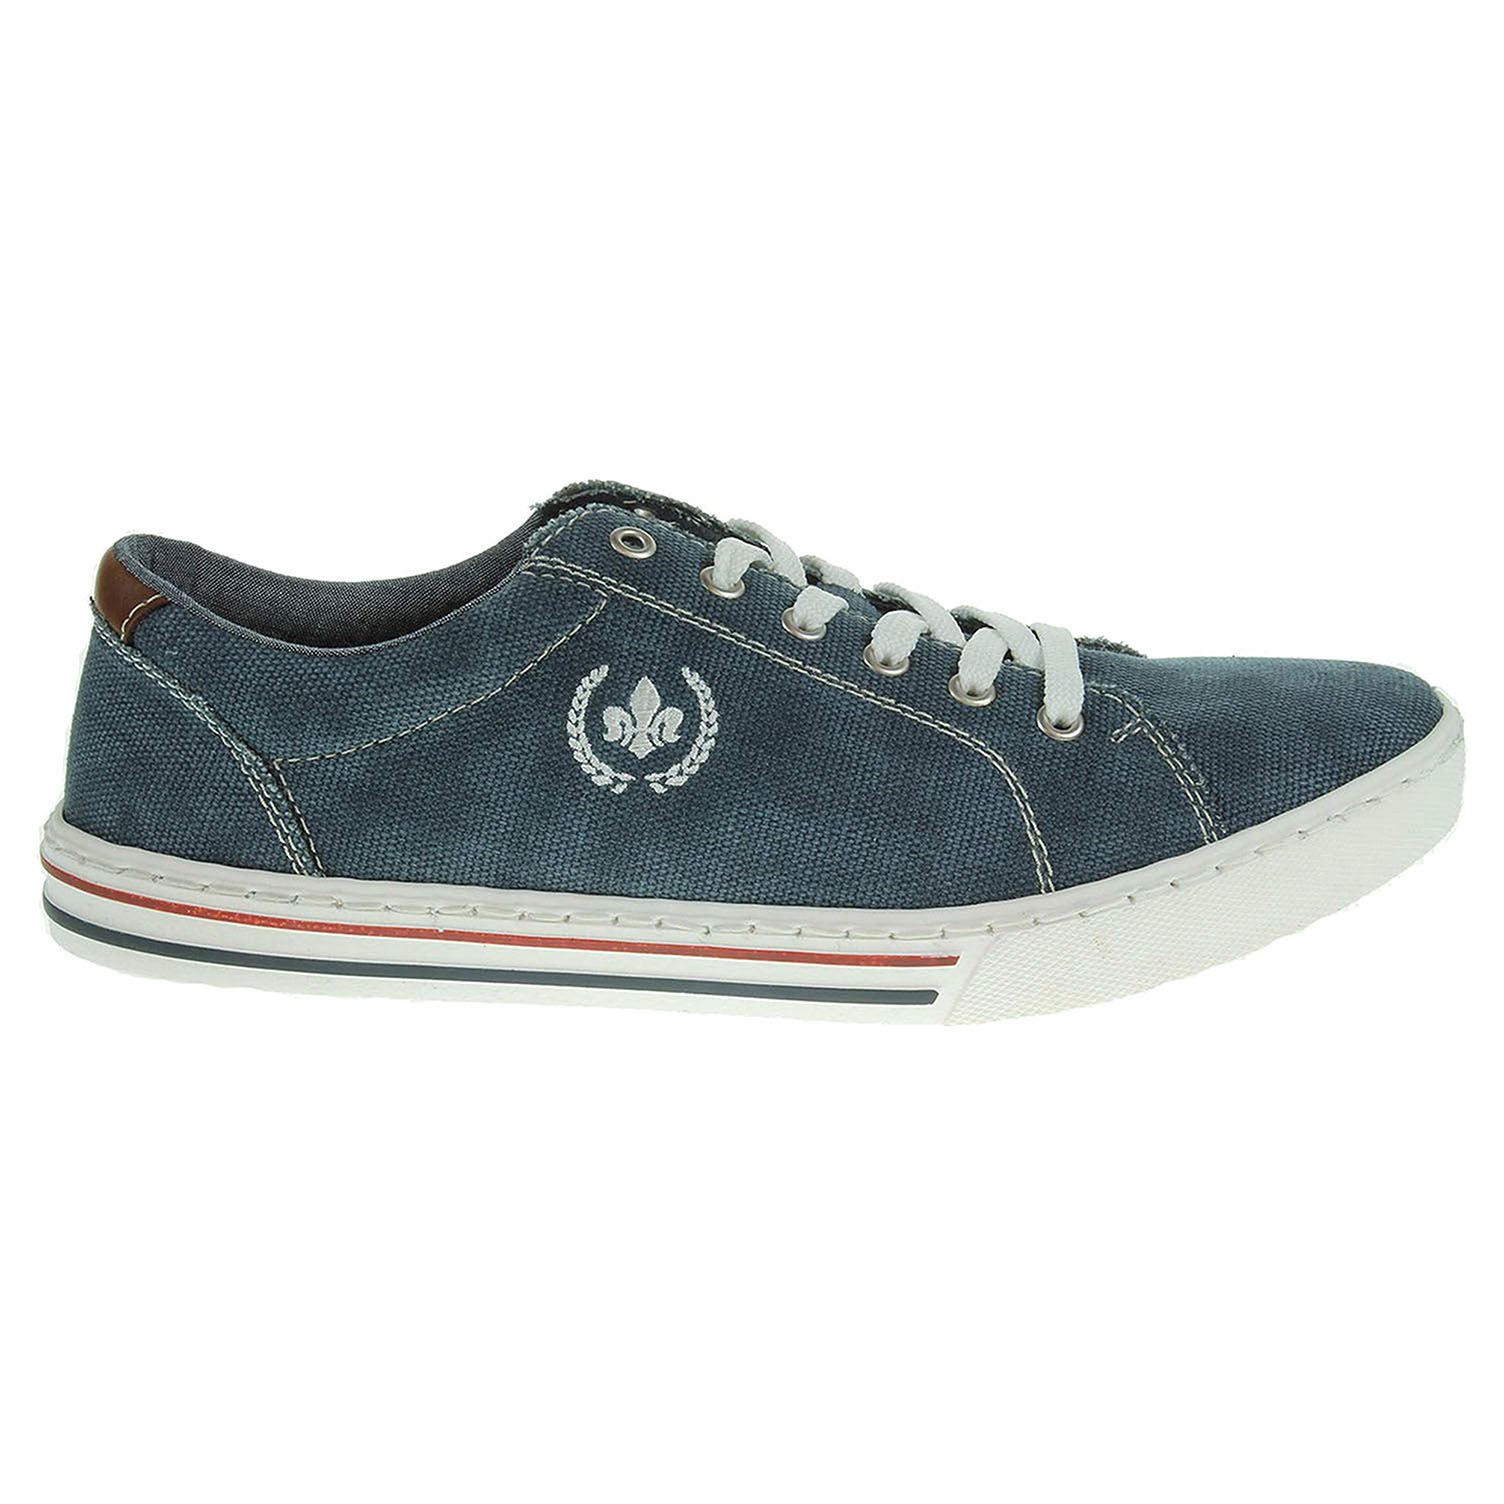 Rieker pánská obuv 19501-14 modrá 46